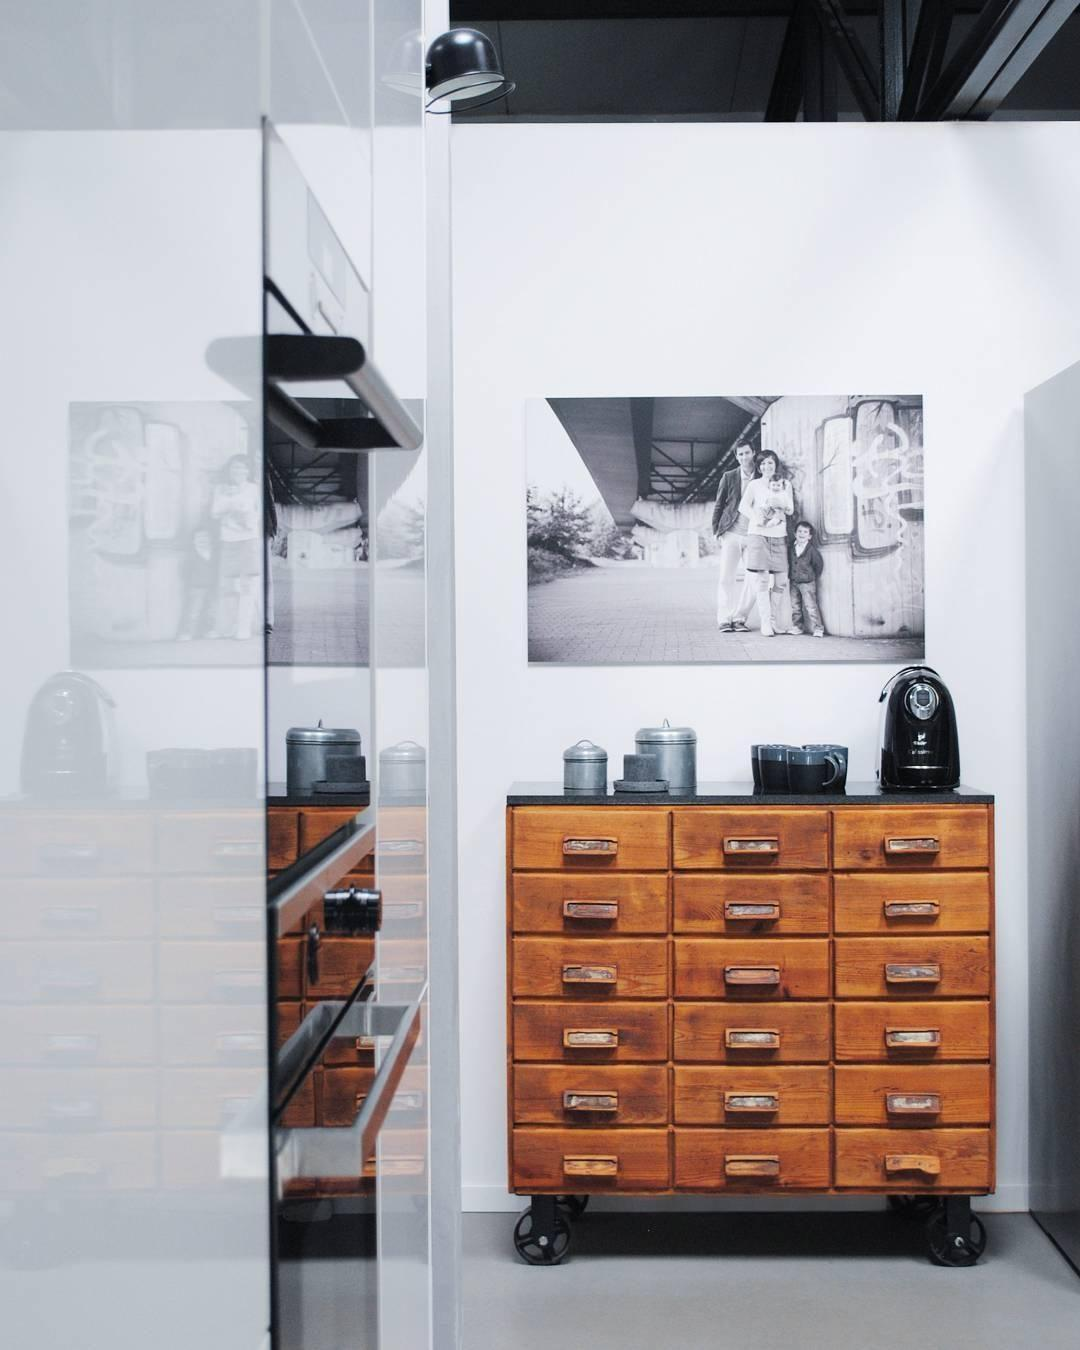 Apothekerschrank Bilder Ideen Couch